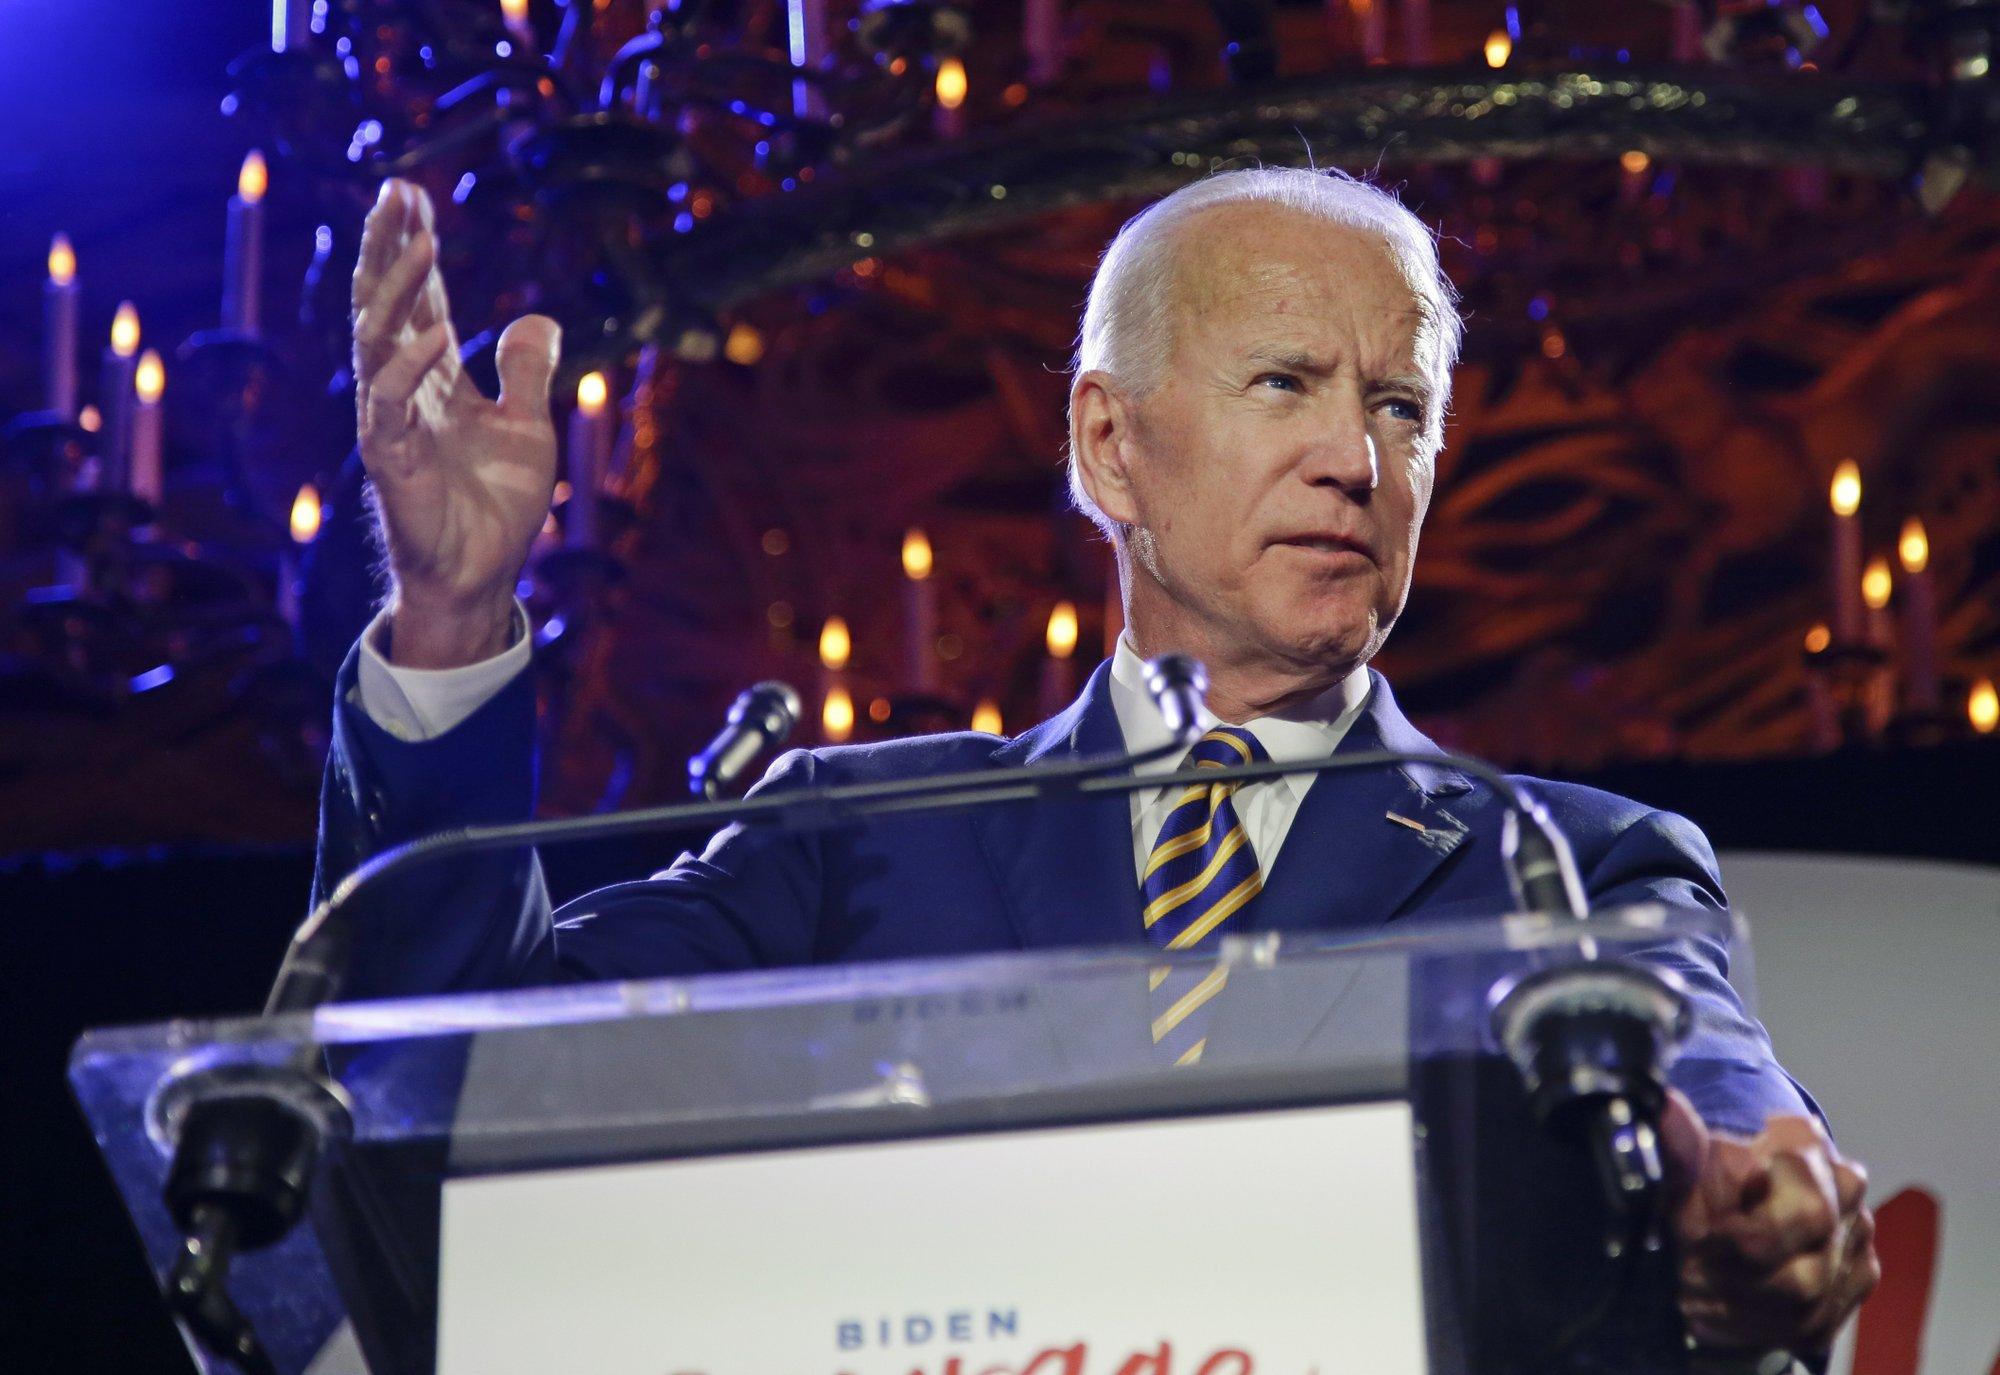 Biden team views Iowa as crucial to securing 2020 nomination